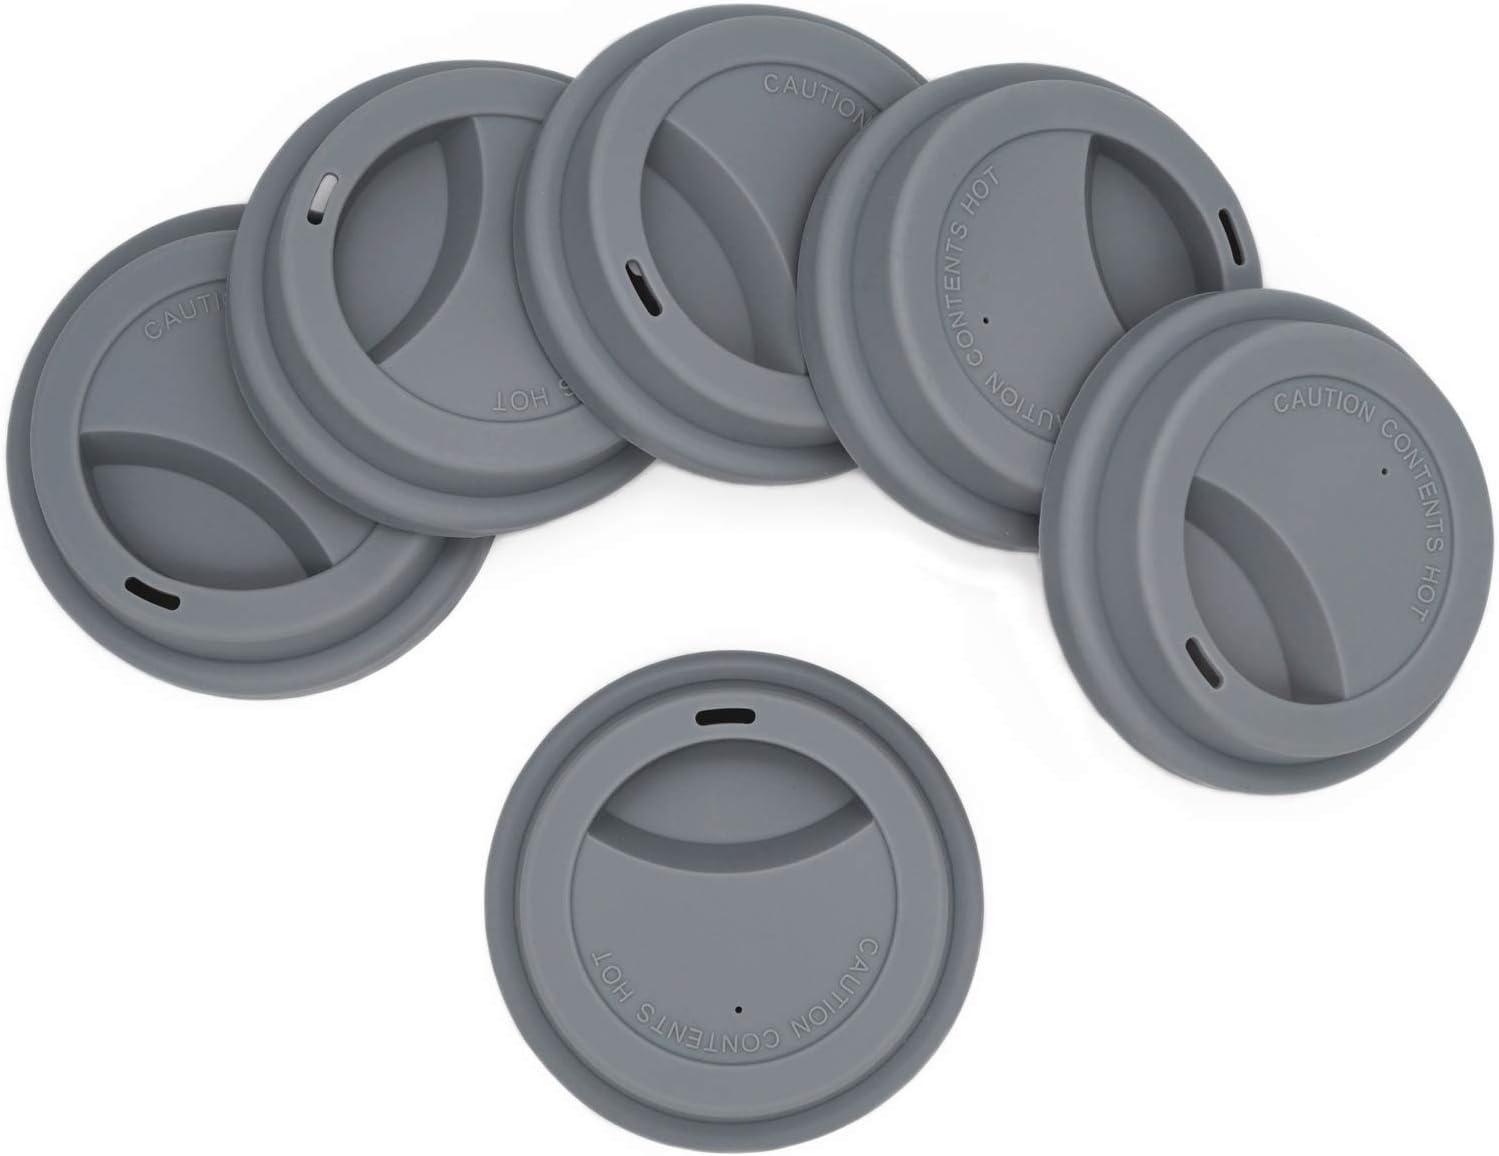 DXLing 6 Piezas Tapa de silicona Tapa de Beber Taza de caf/é Reutilizable con dise/ño de diamantes Cubierta de Copa de Diamante Antipolvo Tapa de Silicona Linda Tapas de Cierre Herm/ético para Tazas